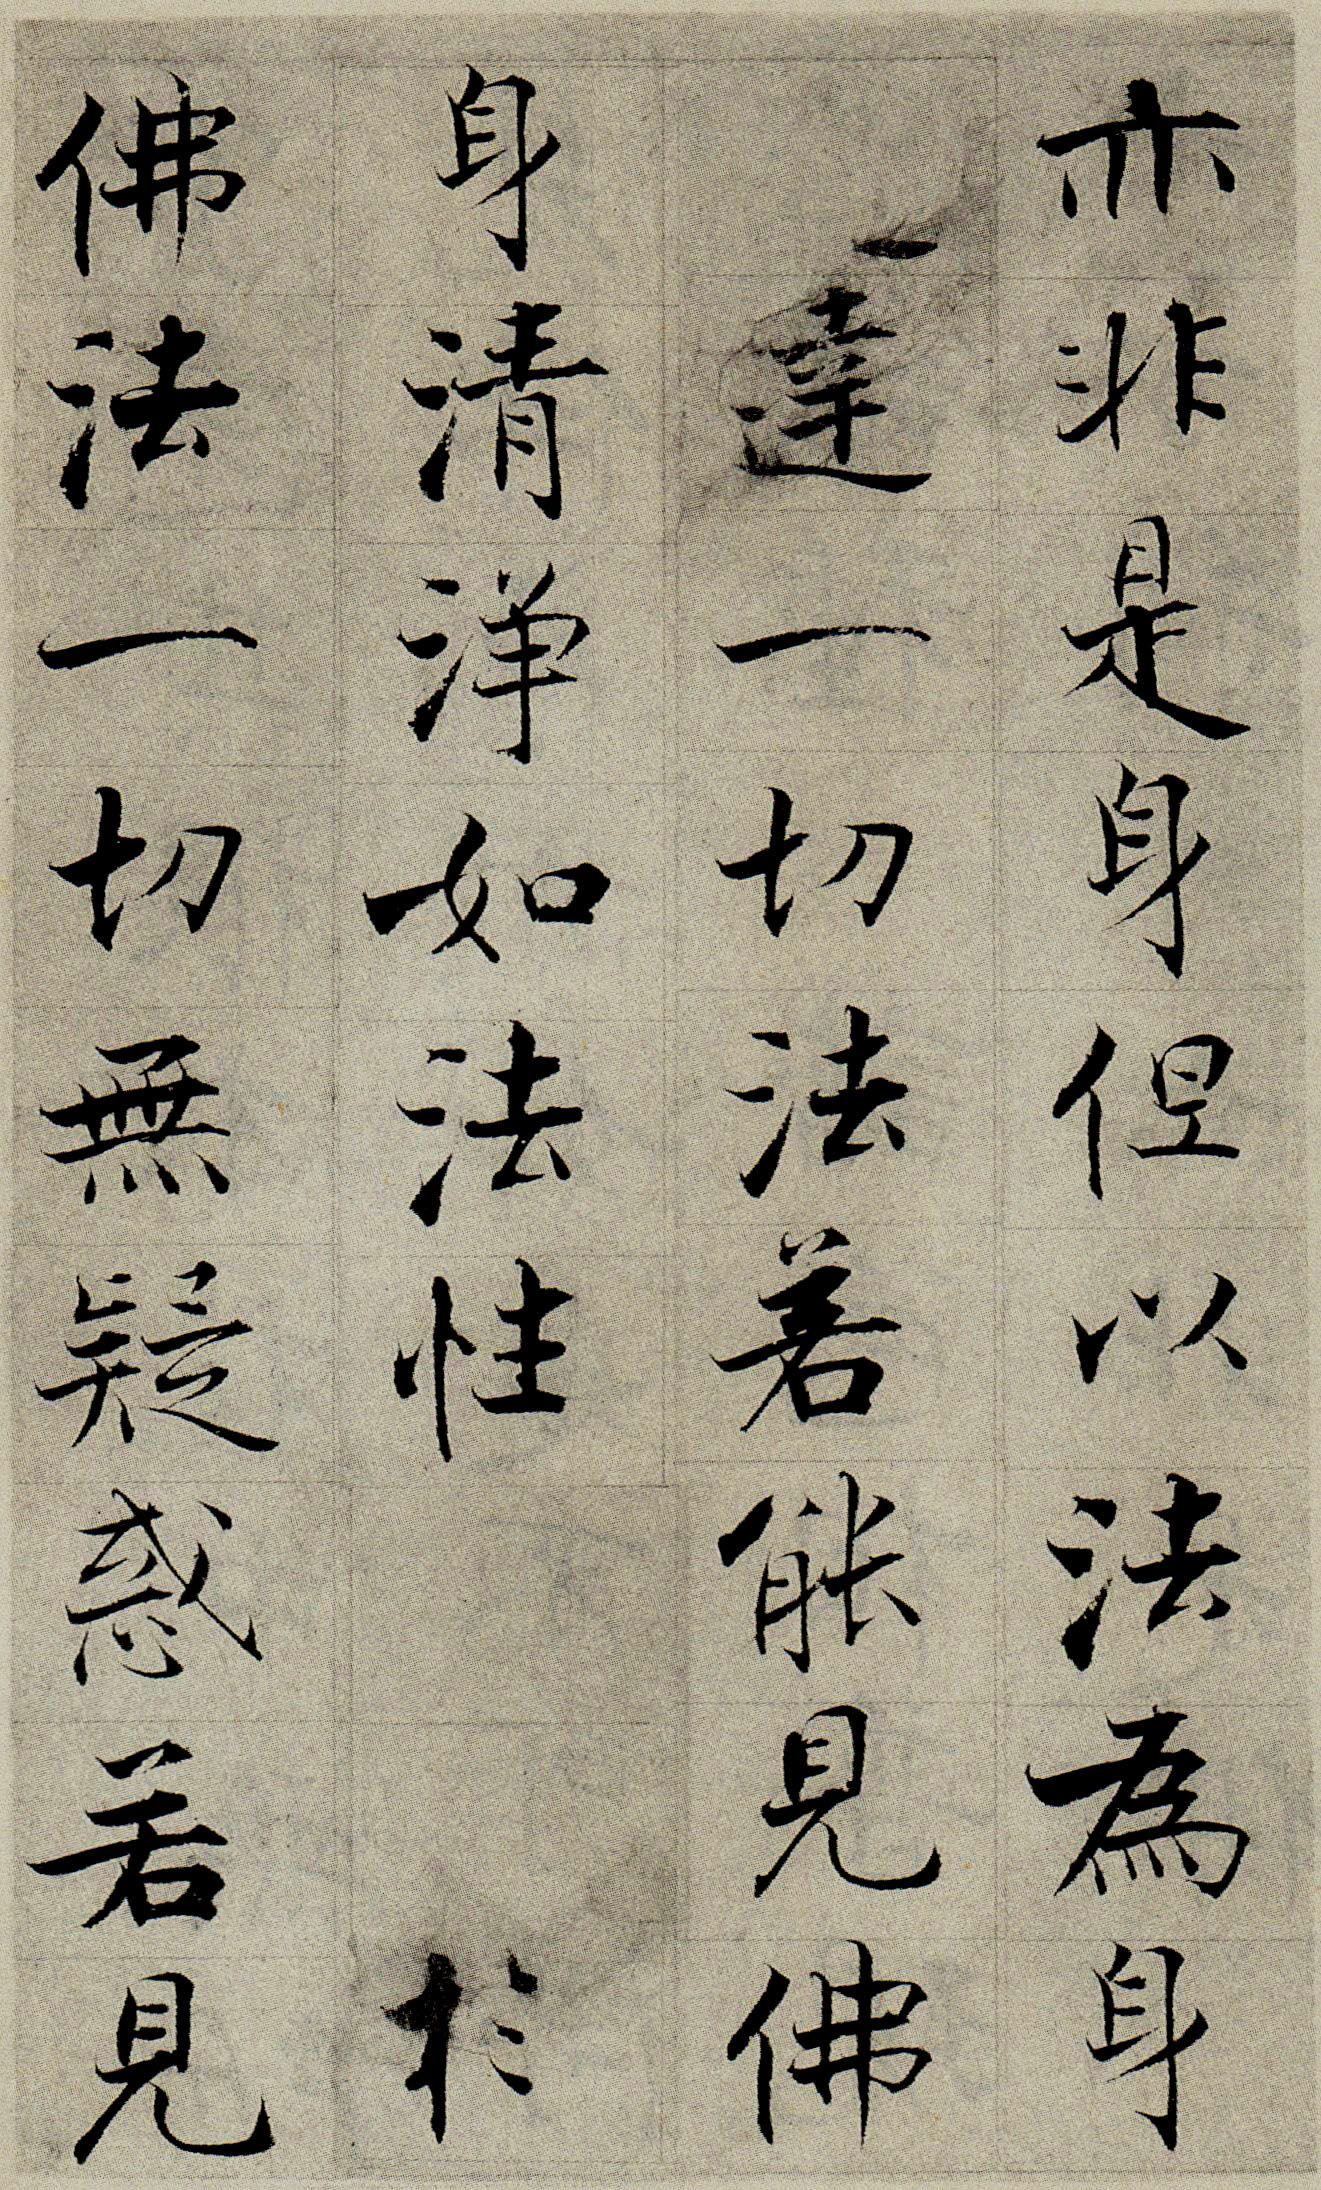 02 南宋 张即之 楷书 华严经残册 Chinese Calligraphy Chinese Art